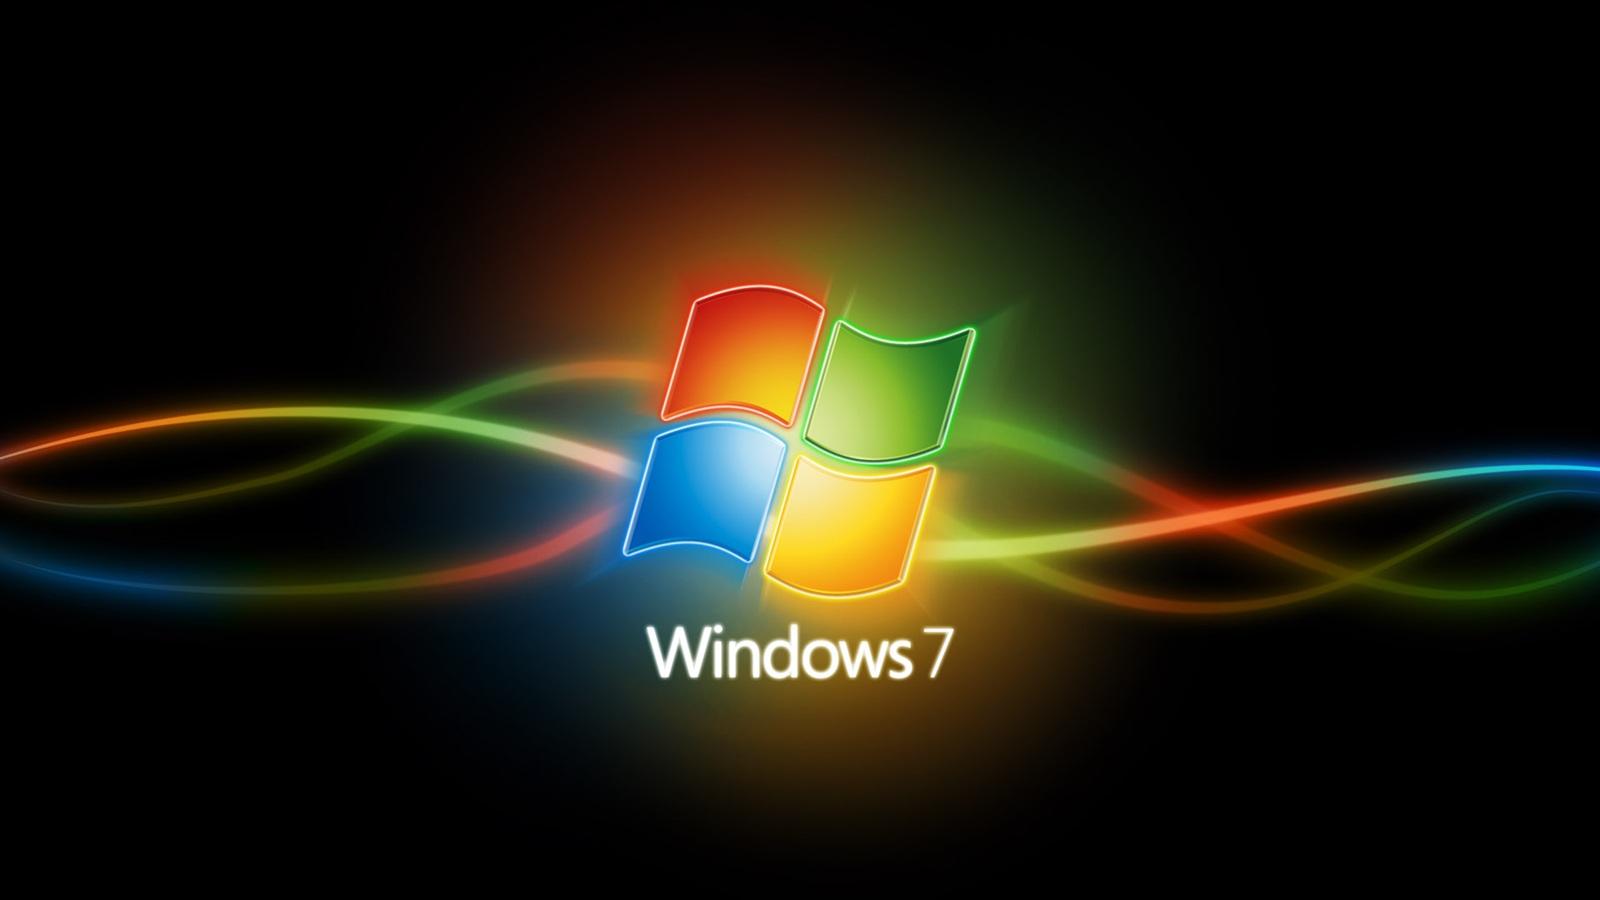 new windows wallpaper colorful - photo #14